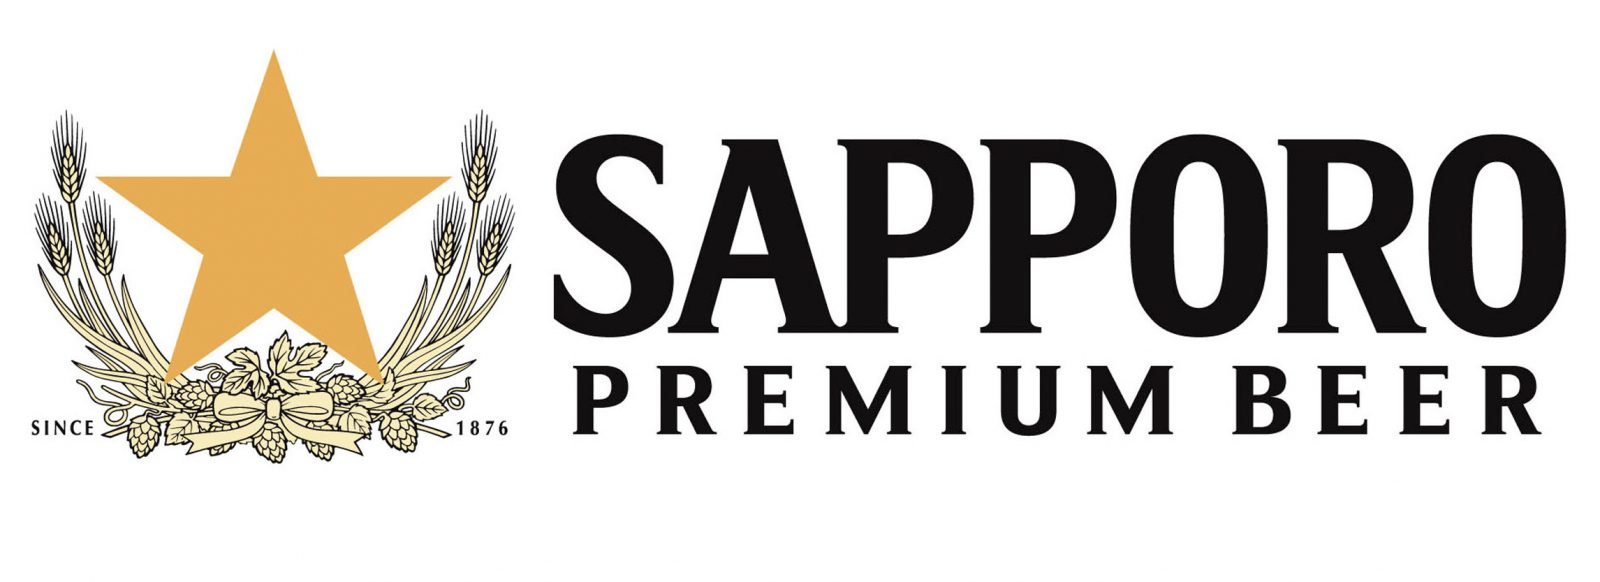 TFAC Sponsor Sapporo Beer